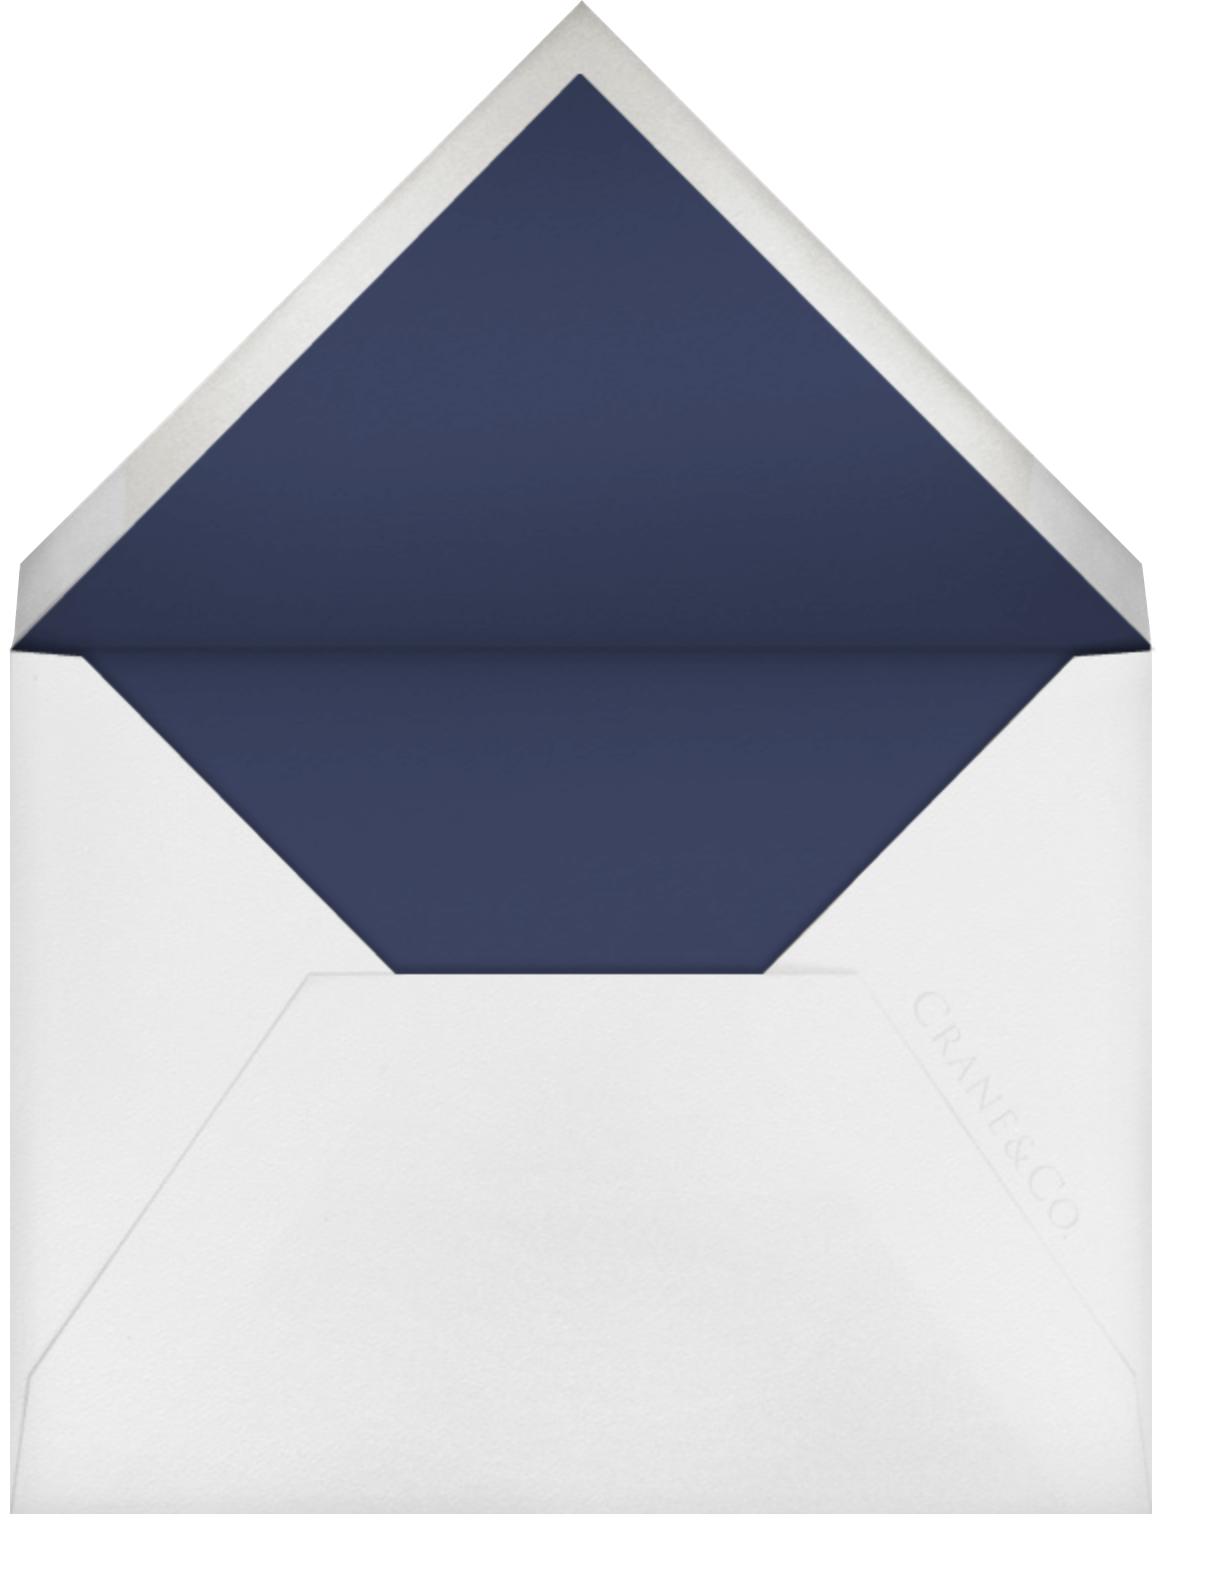 Lamina I (Invitation) - Navy - Paperless Post - All - envelope back